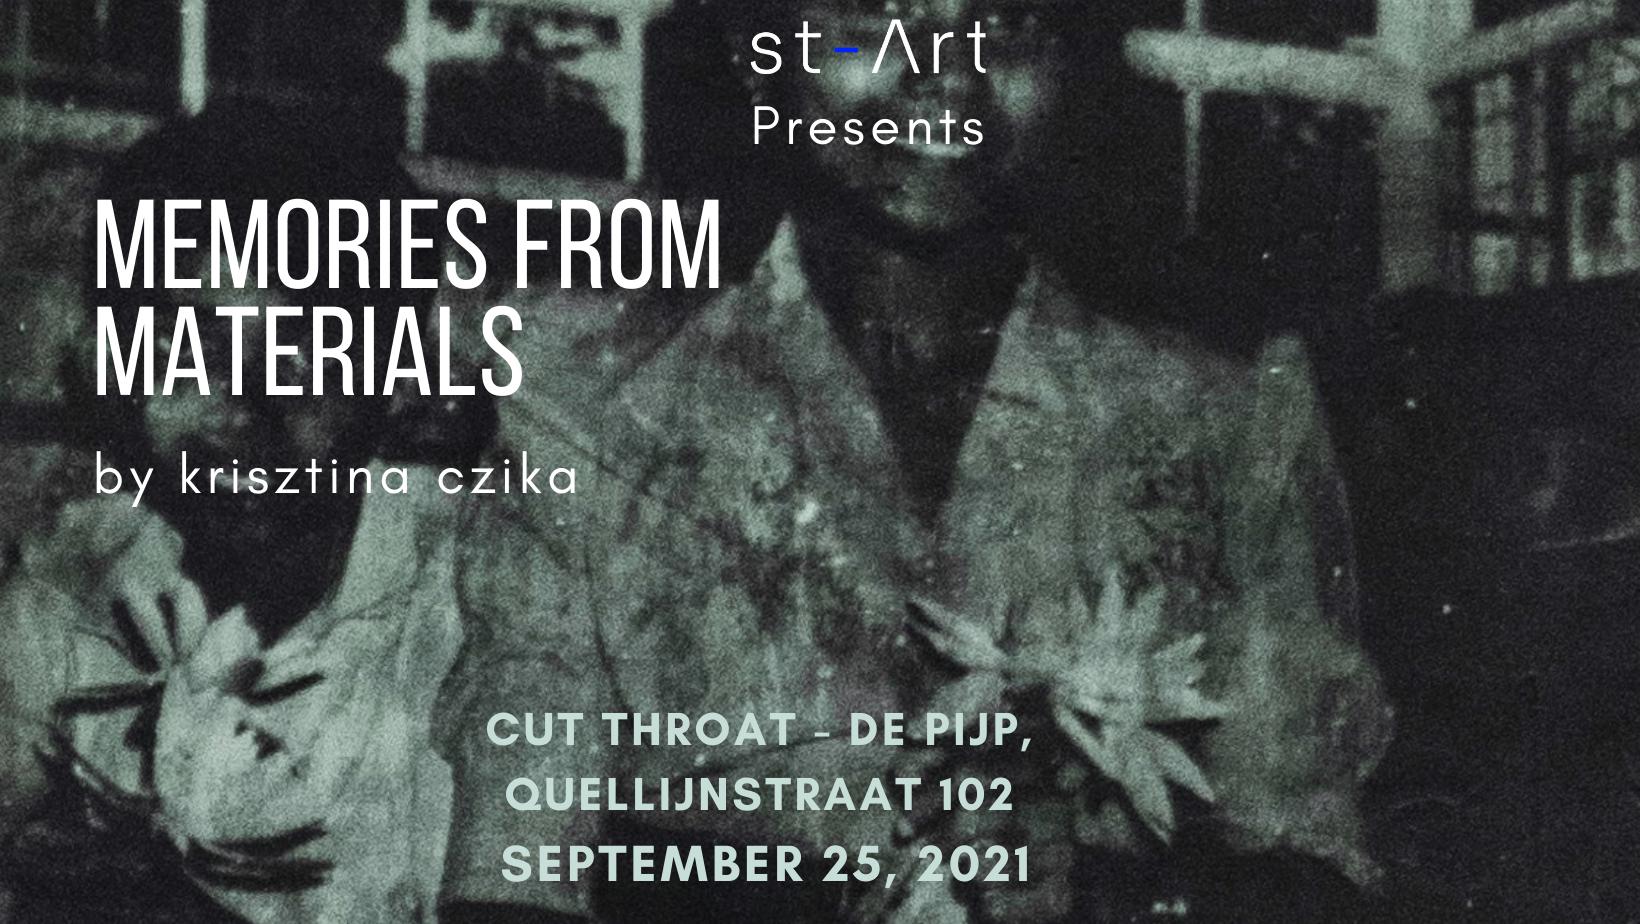 art exhibition, memories from materials by Krisztina Czika, flyer